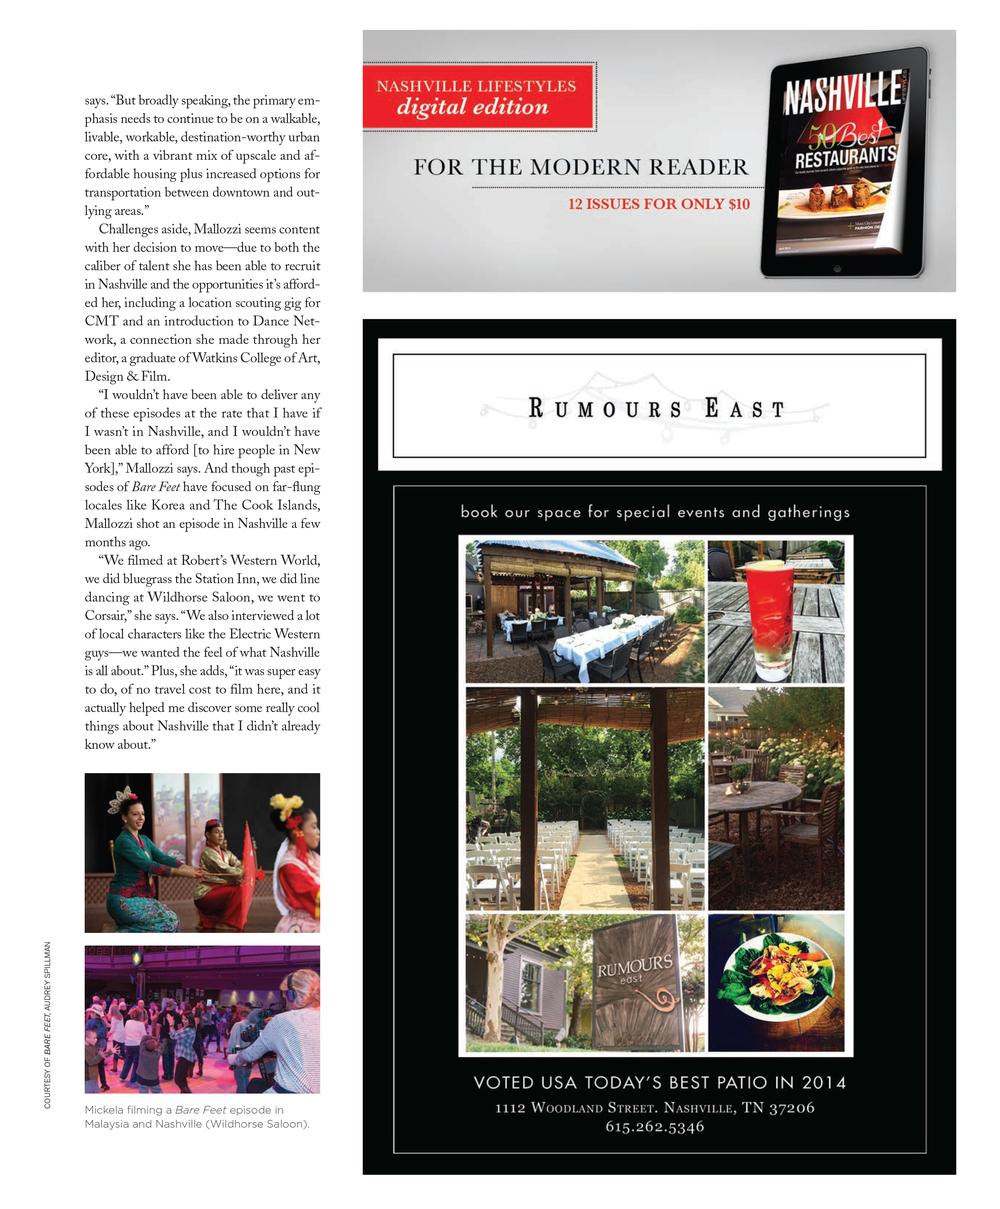 Nashville_Lifestyes_Article-7.jpg